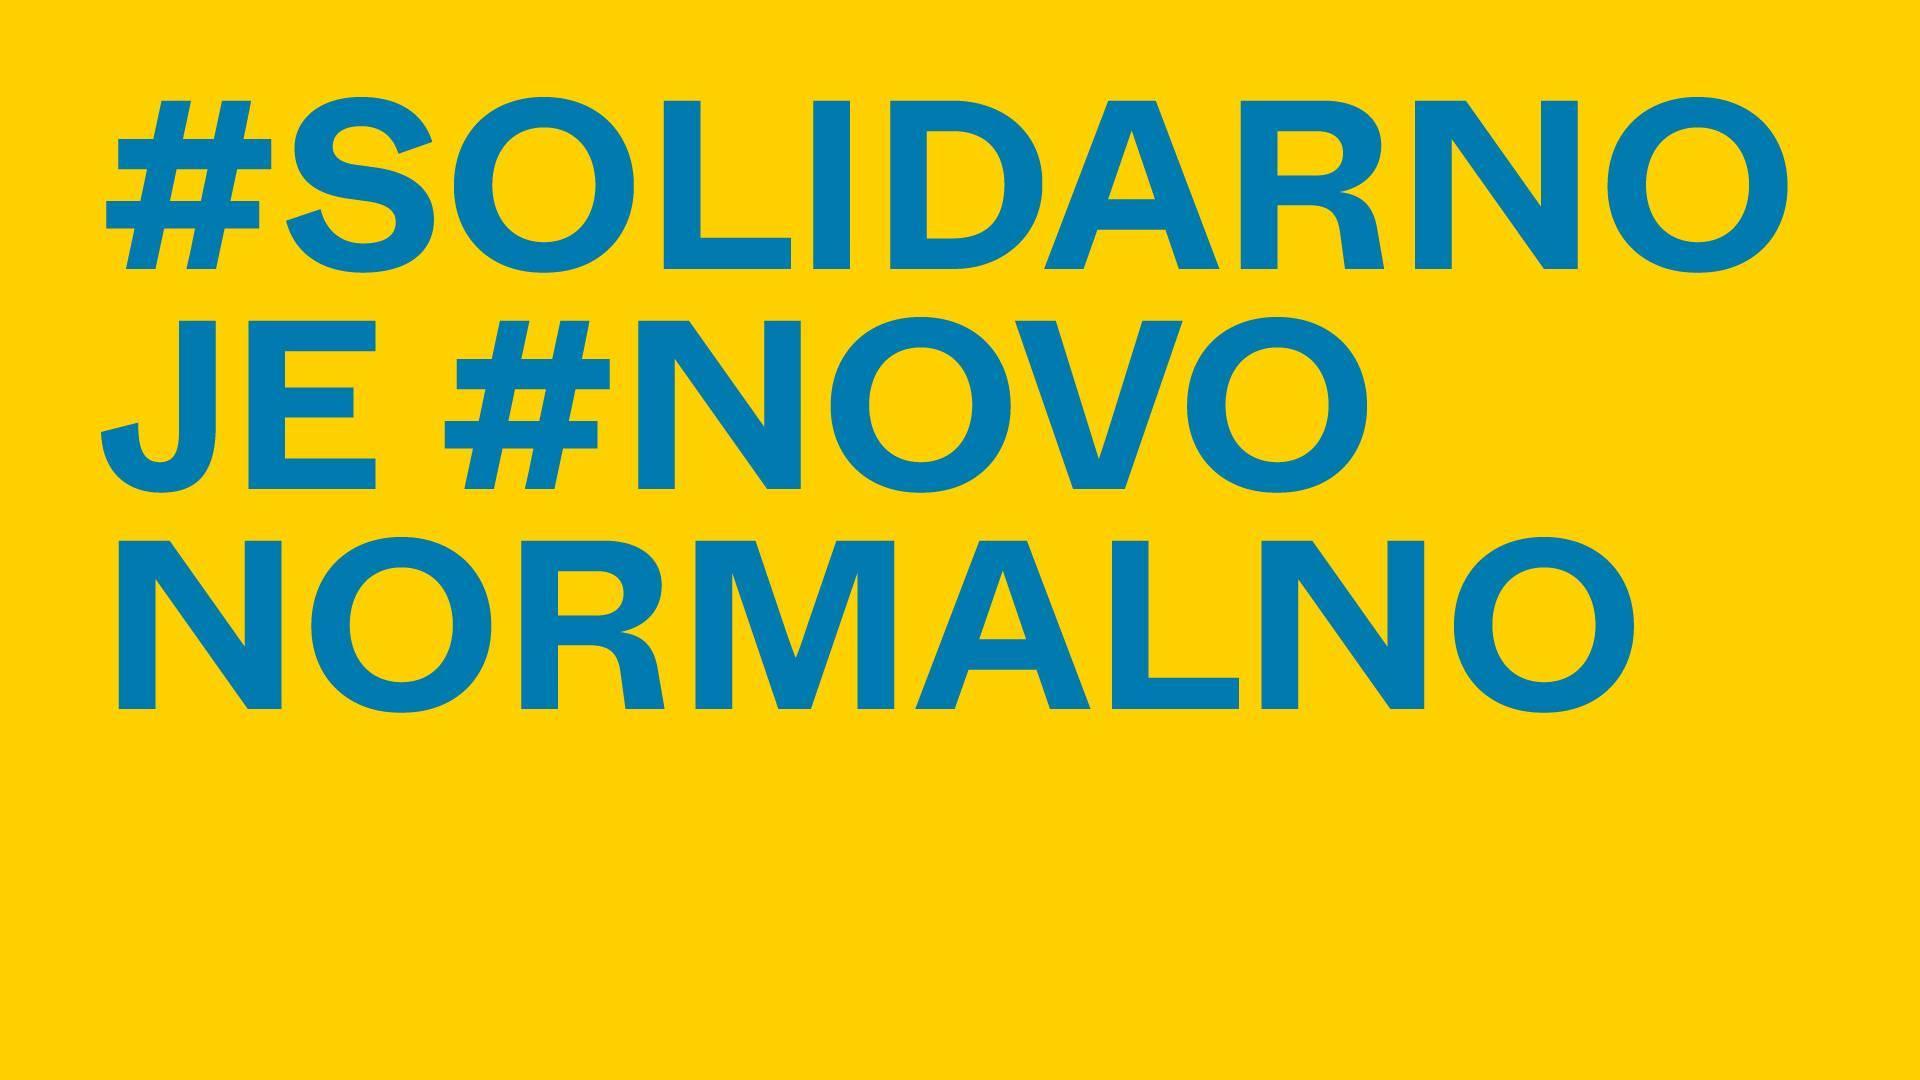 #Solidarno kao naše #NovoNormalno? - 5 godina Solidarne   Human Rights Film Festival